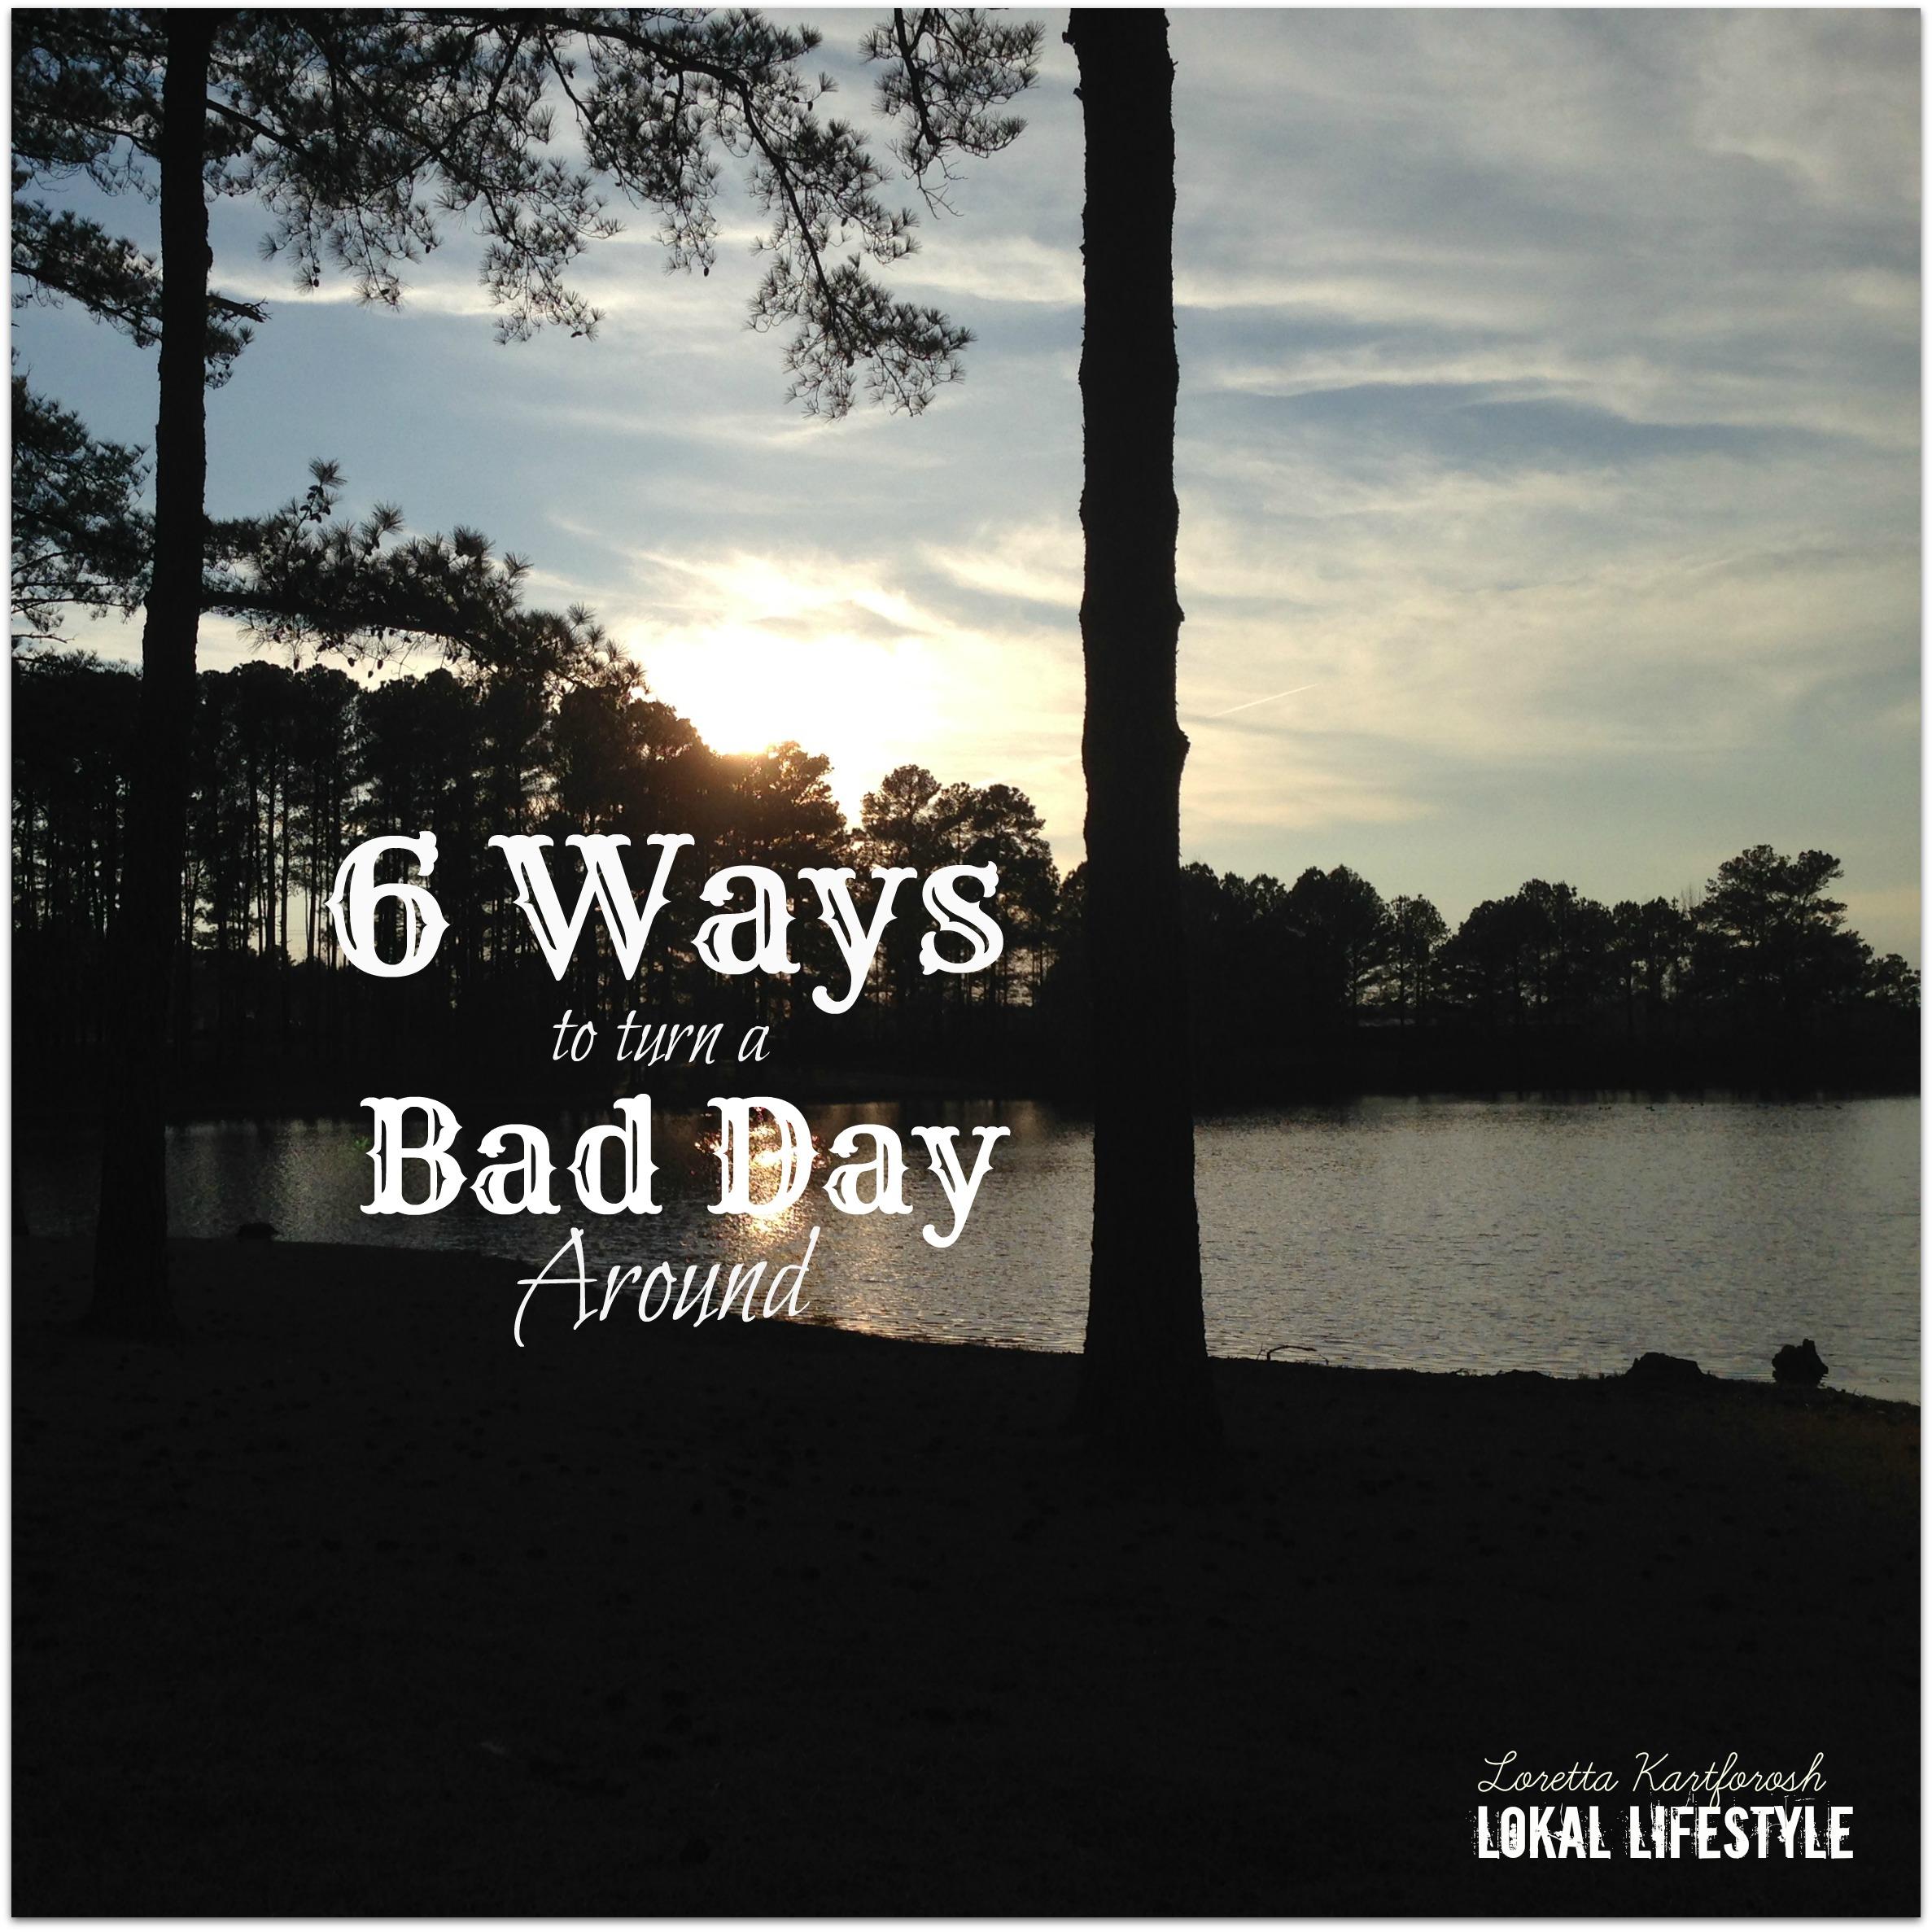 6 Ways to Turn a Bad Day Around